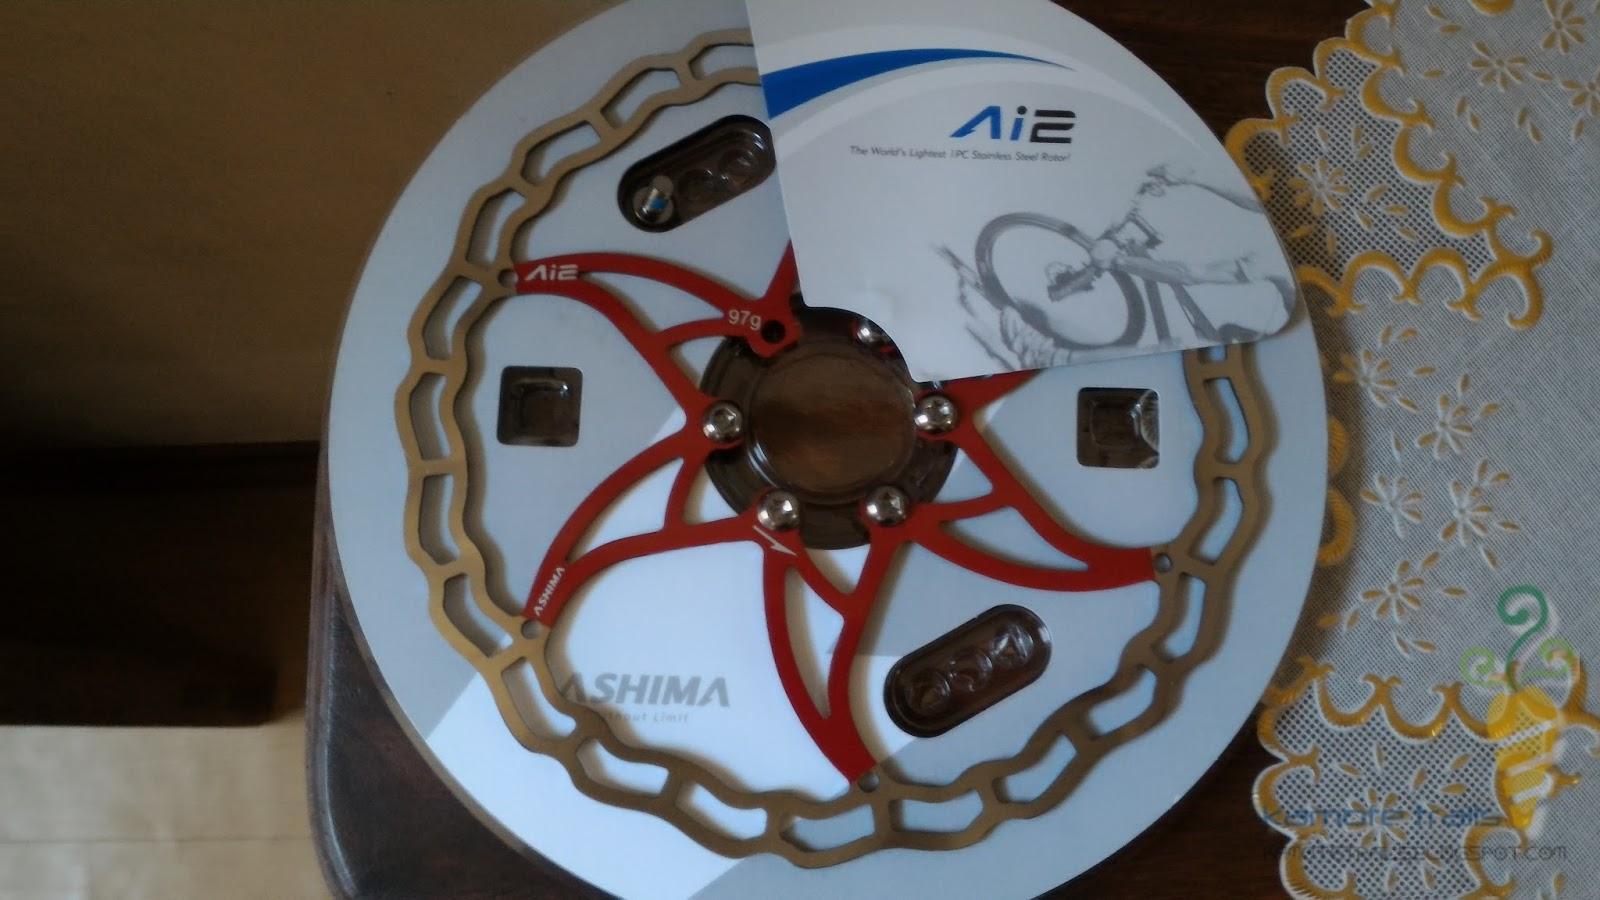 The World/'s lightest Disc brake rotor 97g 180mm-Red vs Ashima Ai2 Ai 2 1 pc